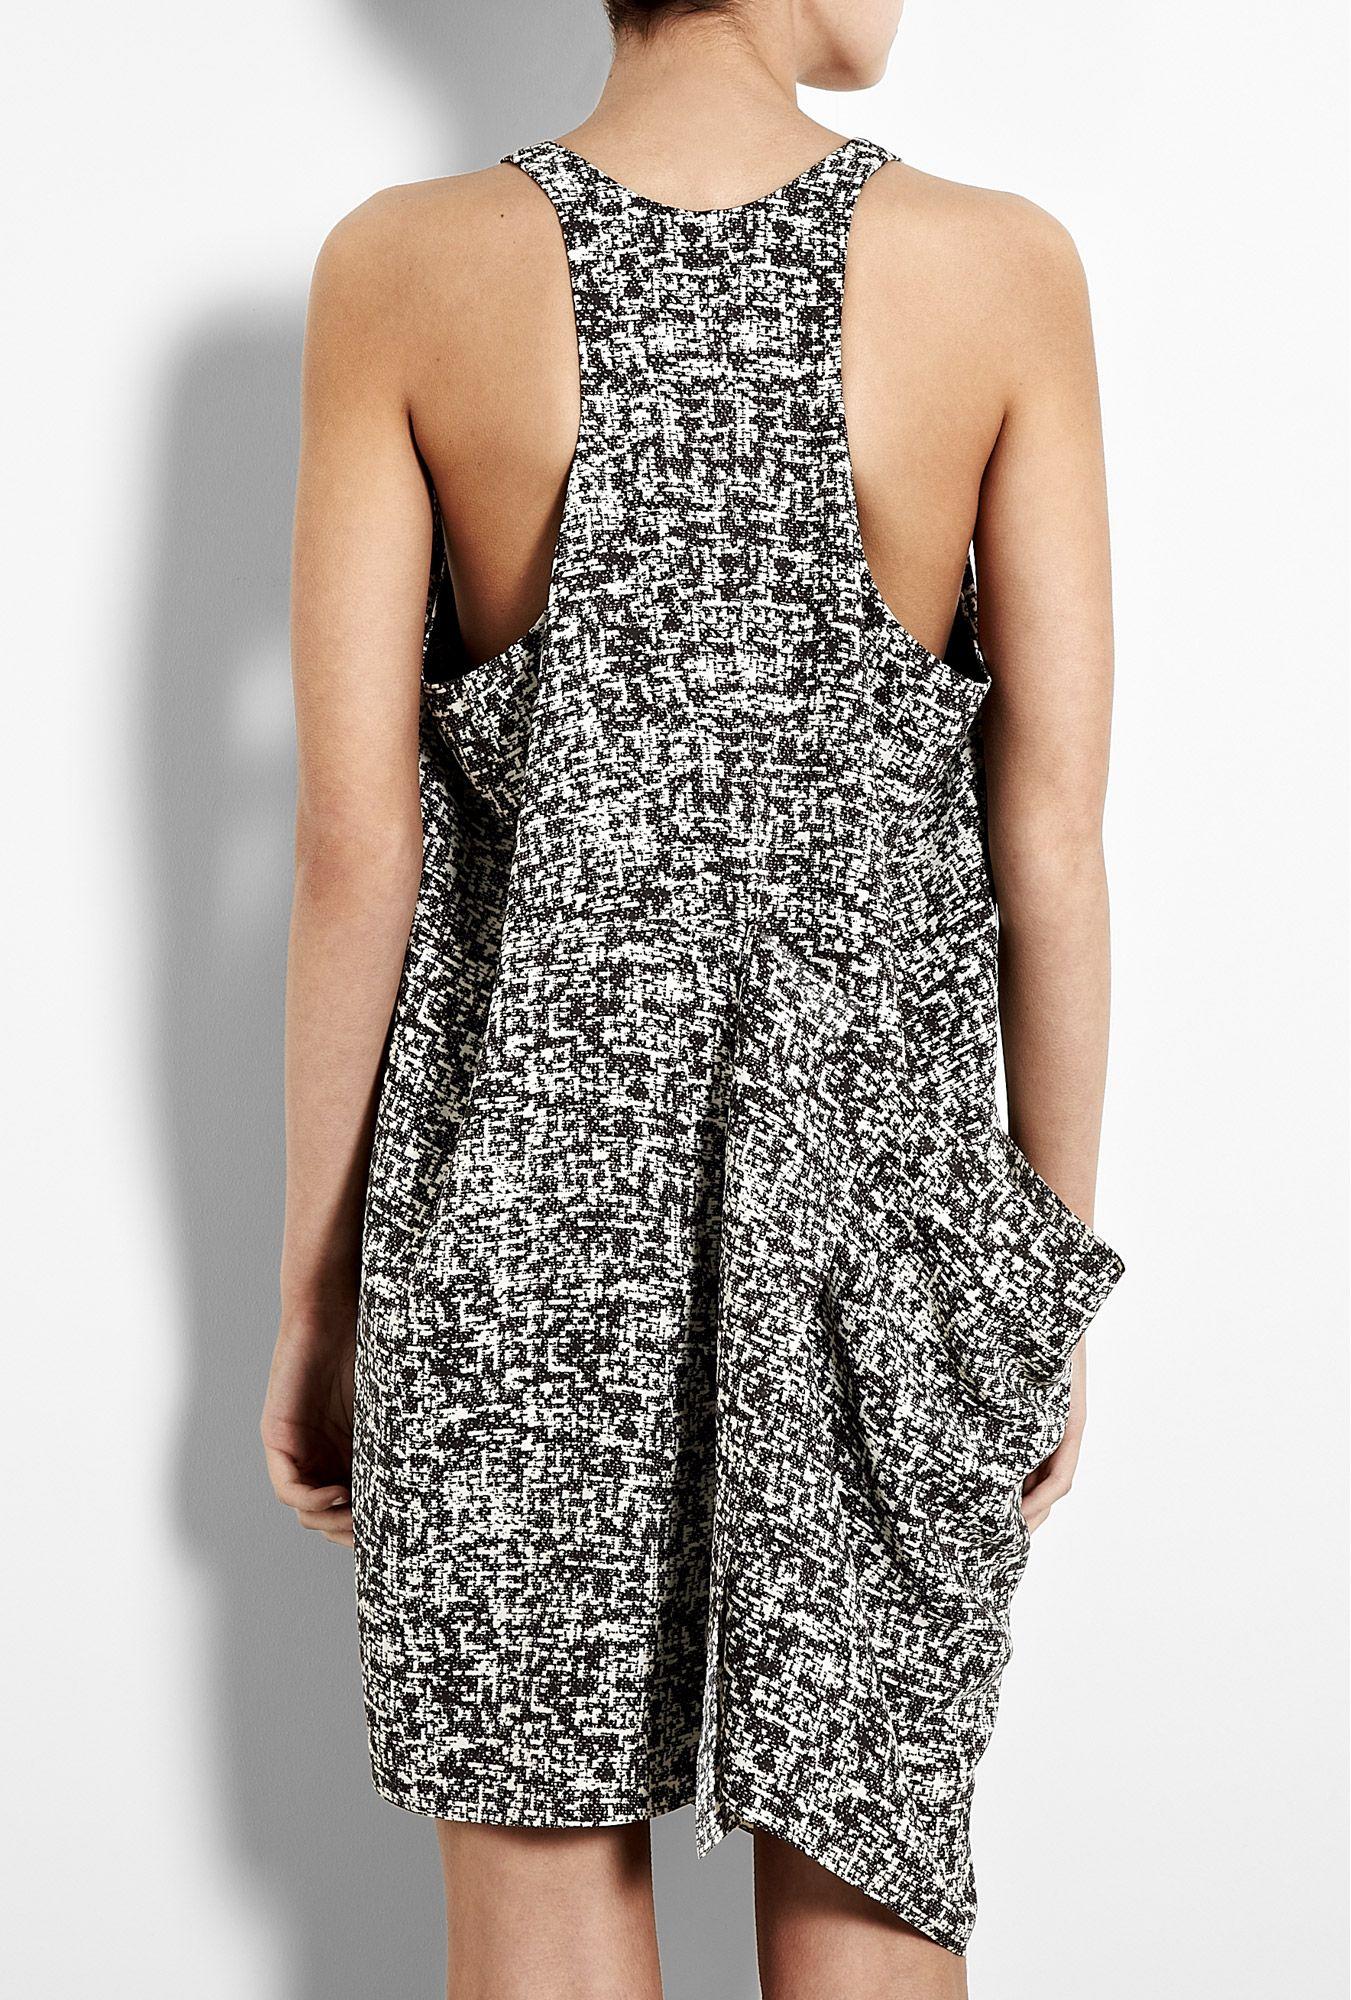 Black and white loose dress blackuwhite pinterest funky